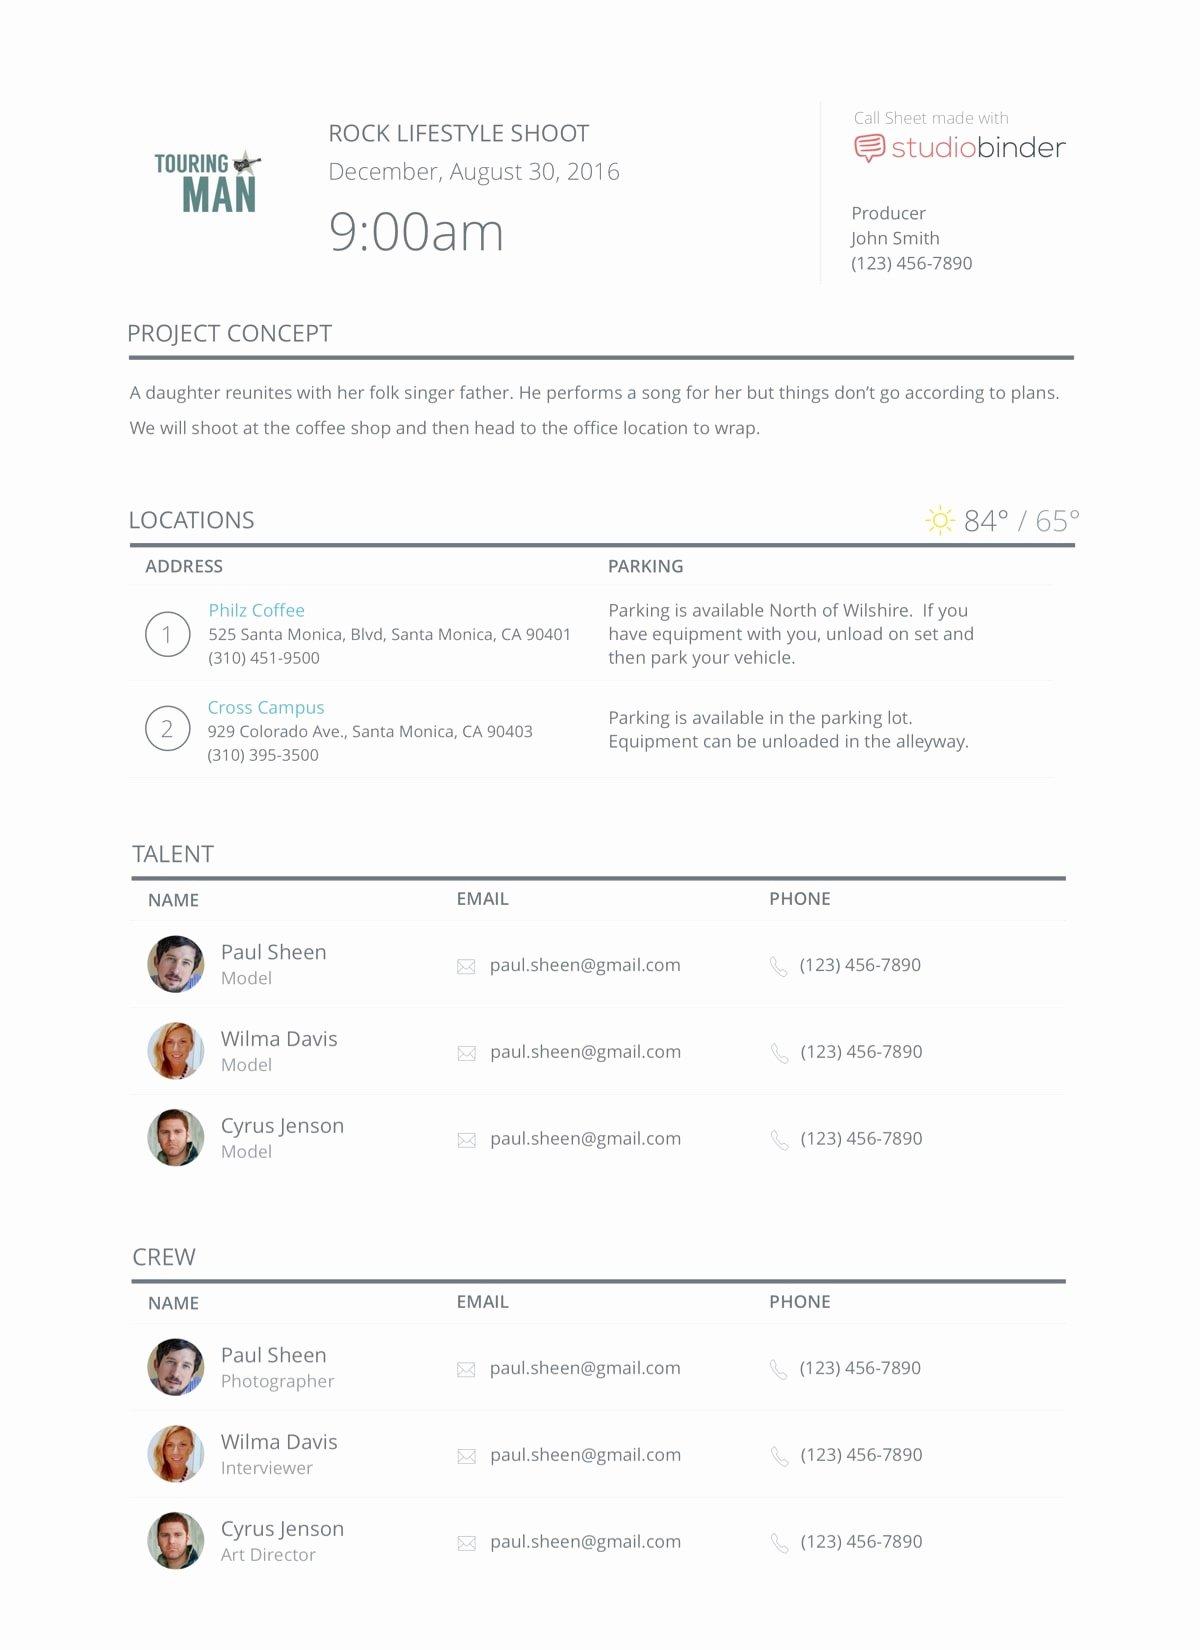 Call Sheet Samples Fresh Elegant Call Sheet Templates when Planning A Shoot